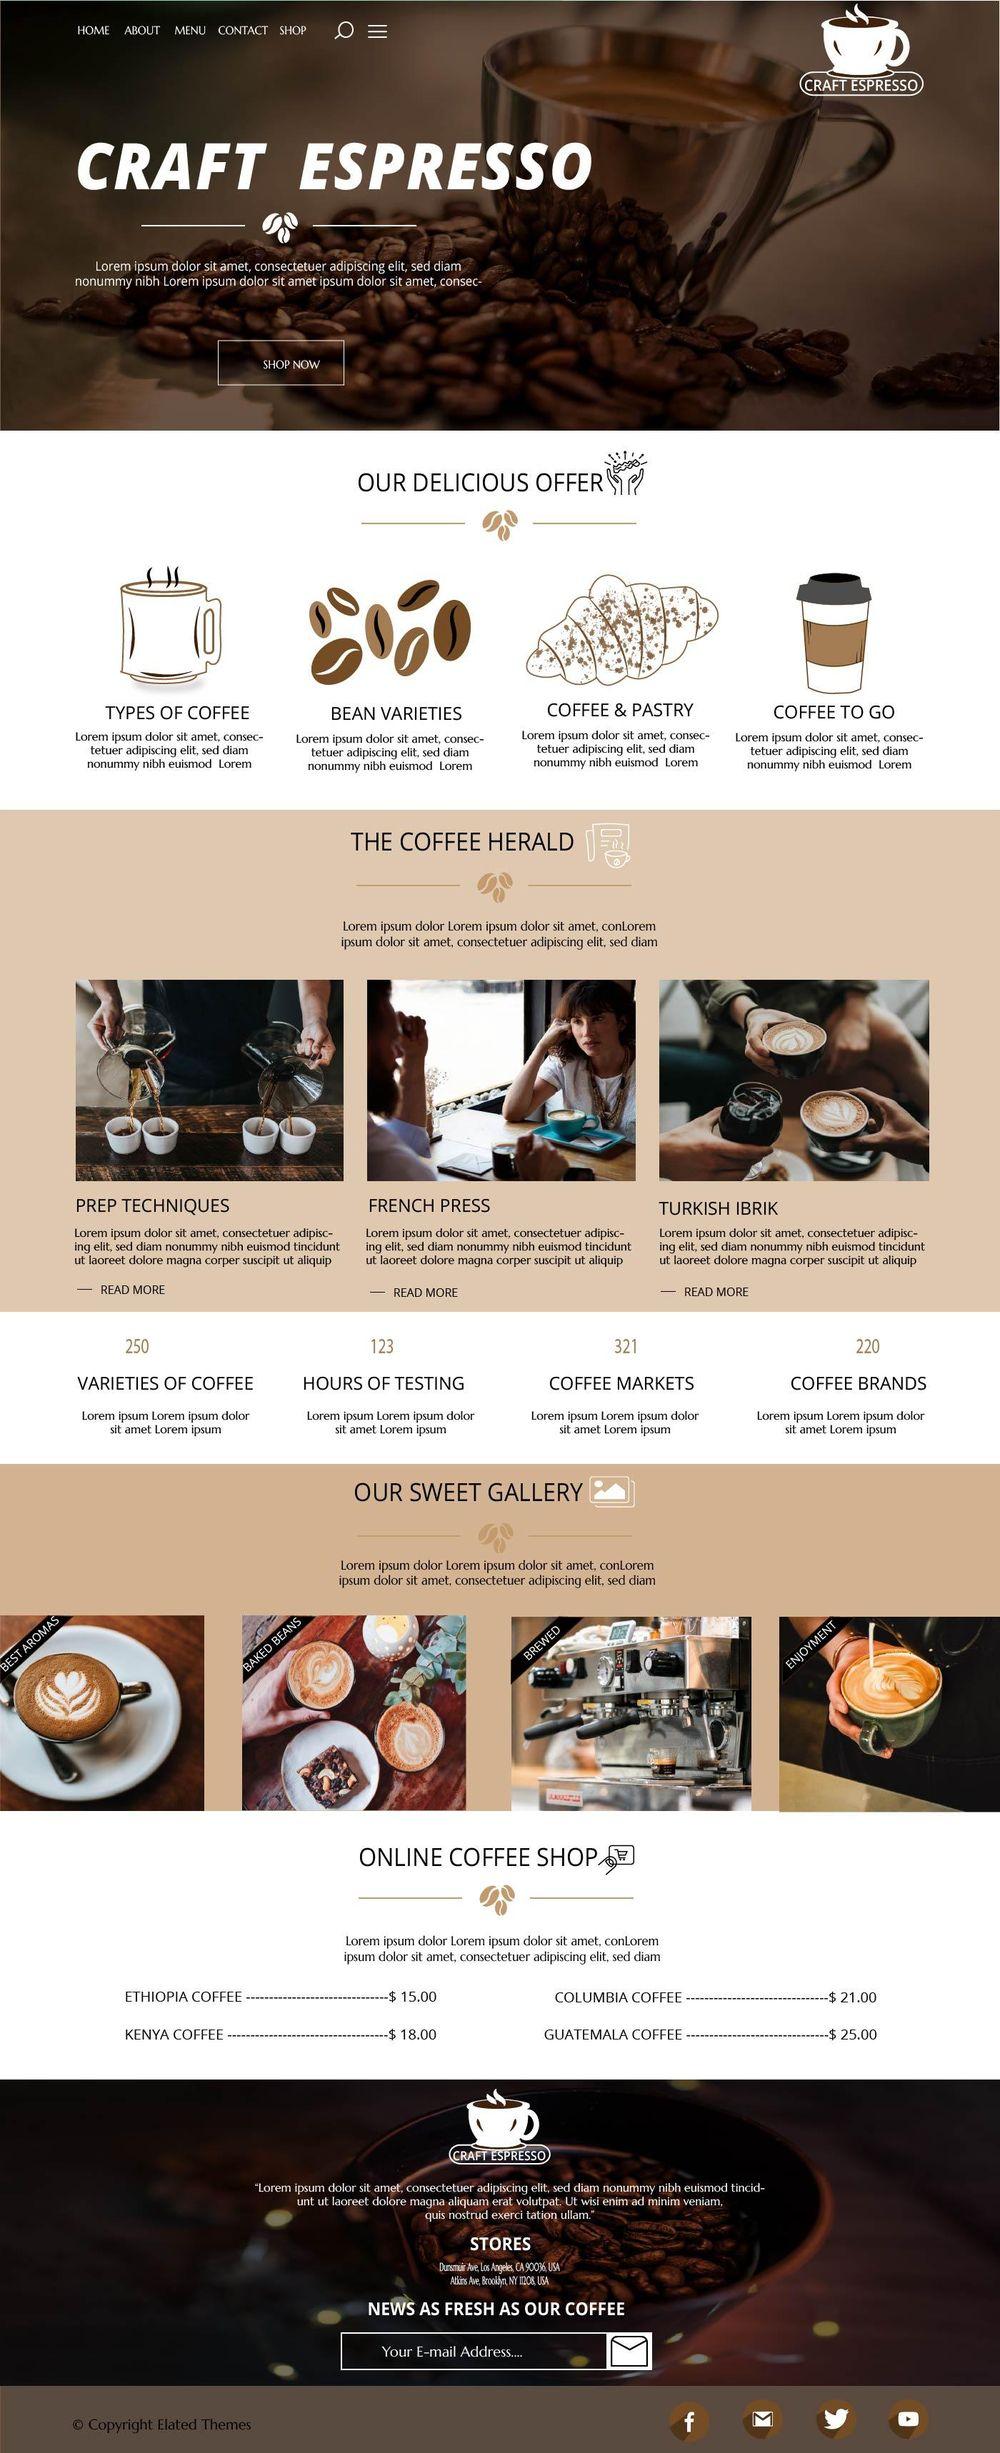 Craft Espresso Web design - image 1 - student project